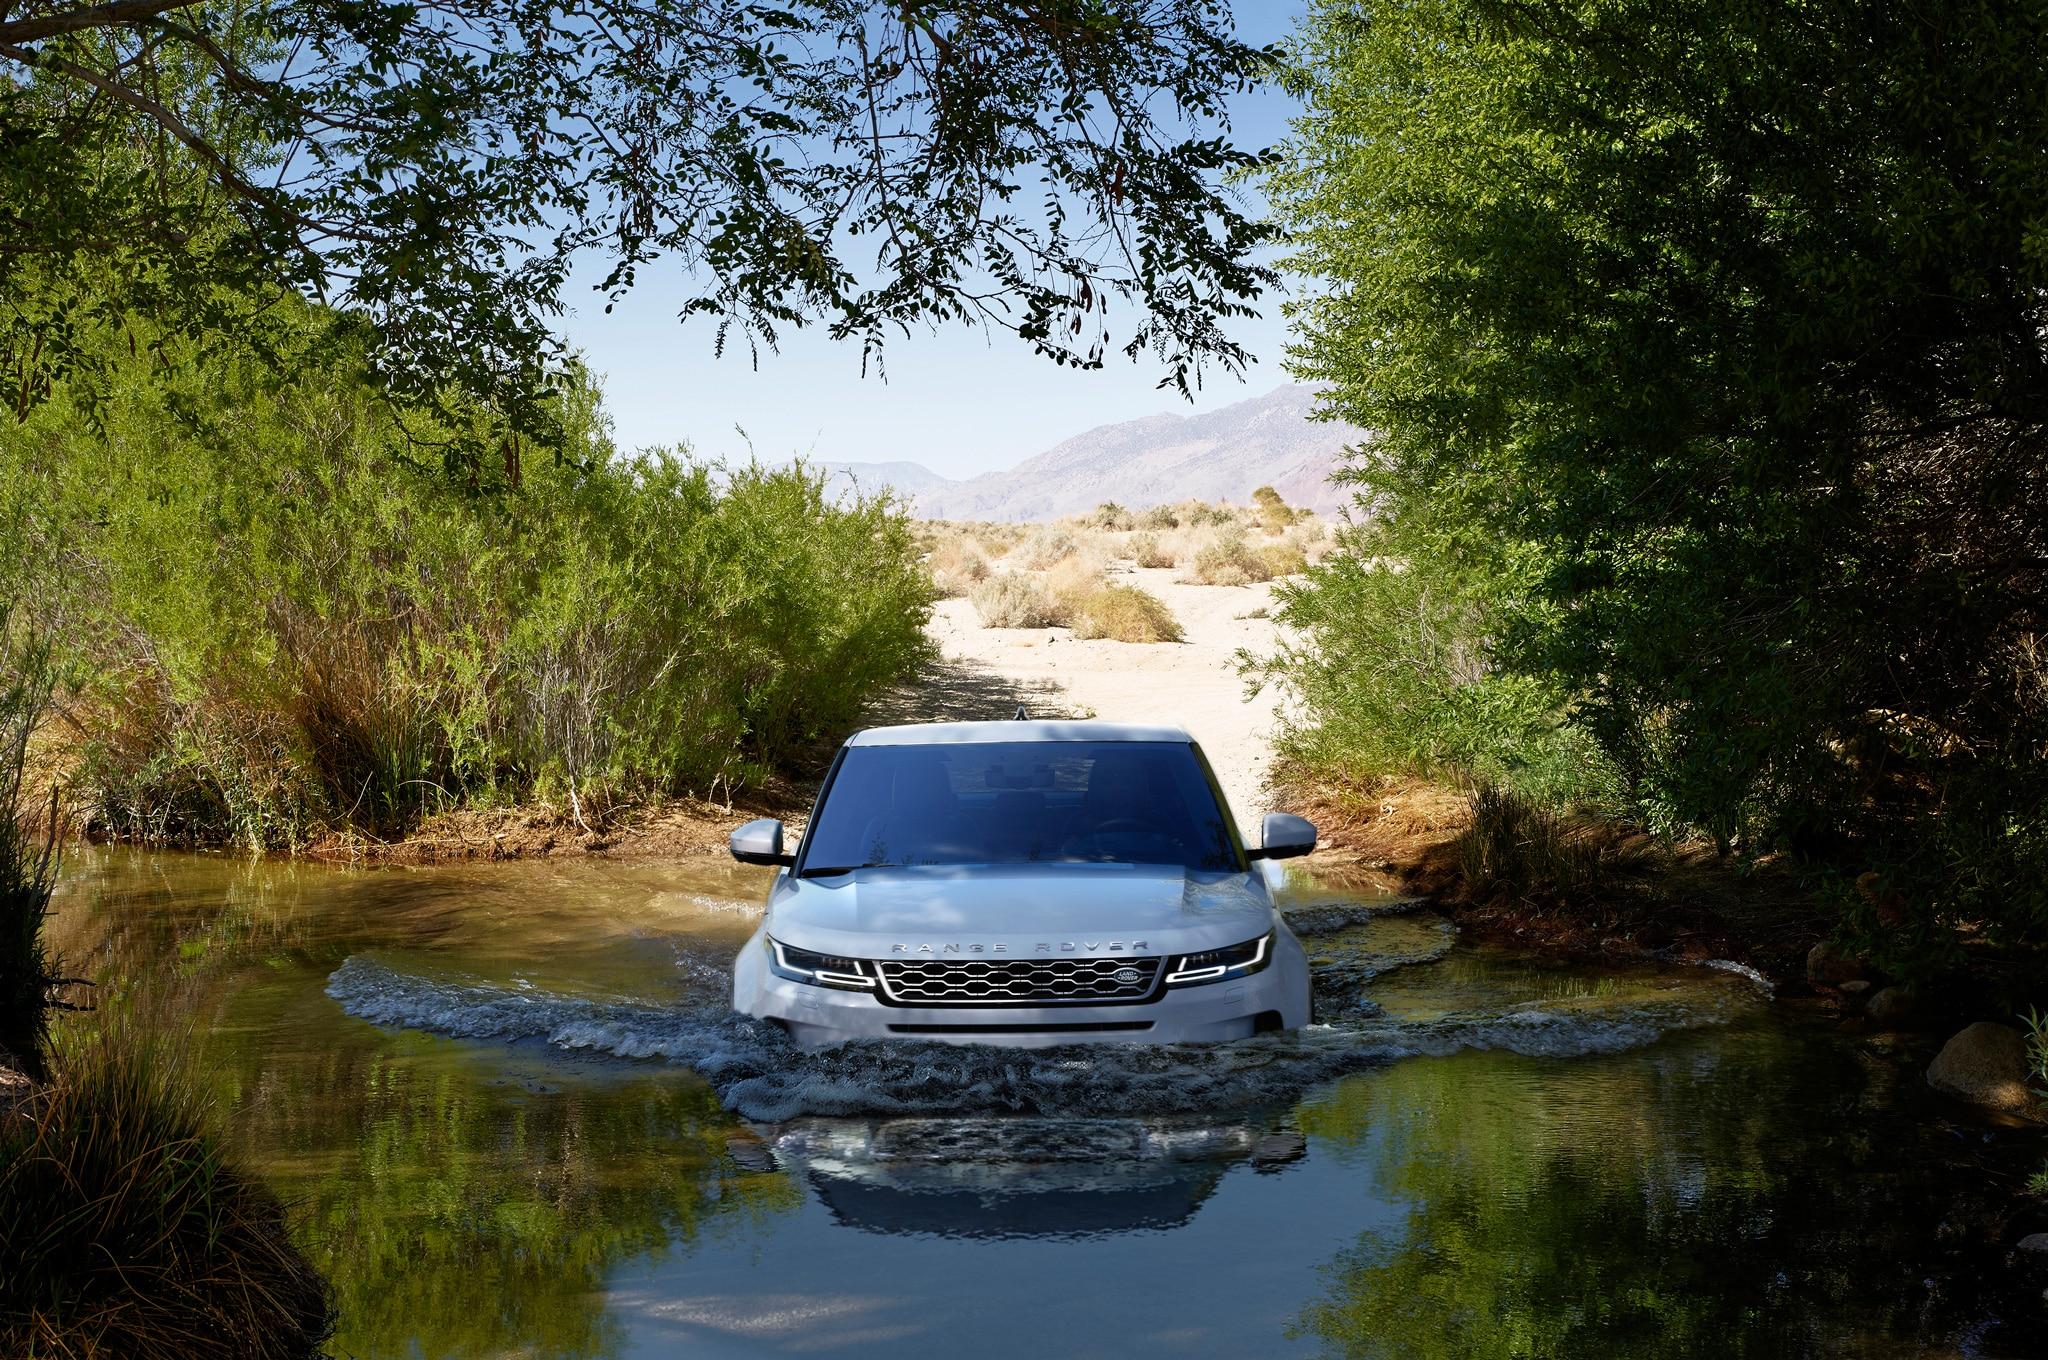 2020 range rover evoque exterior off road front view 01